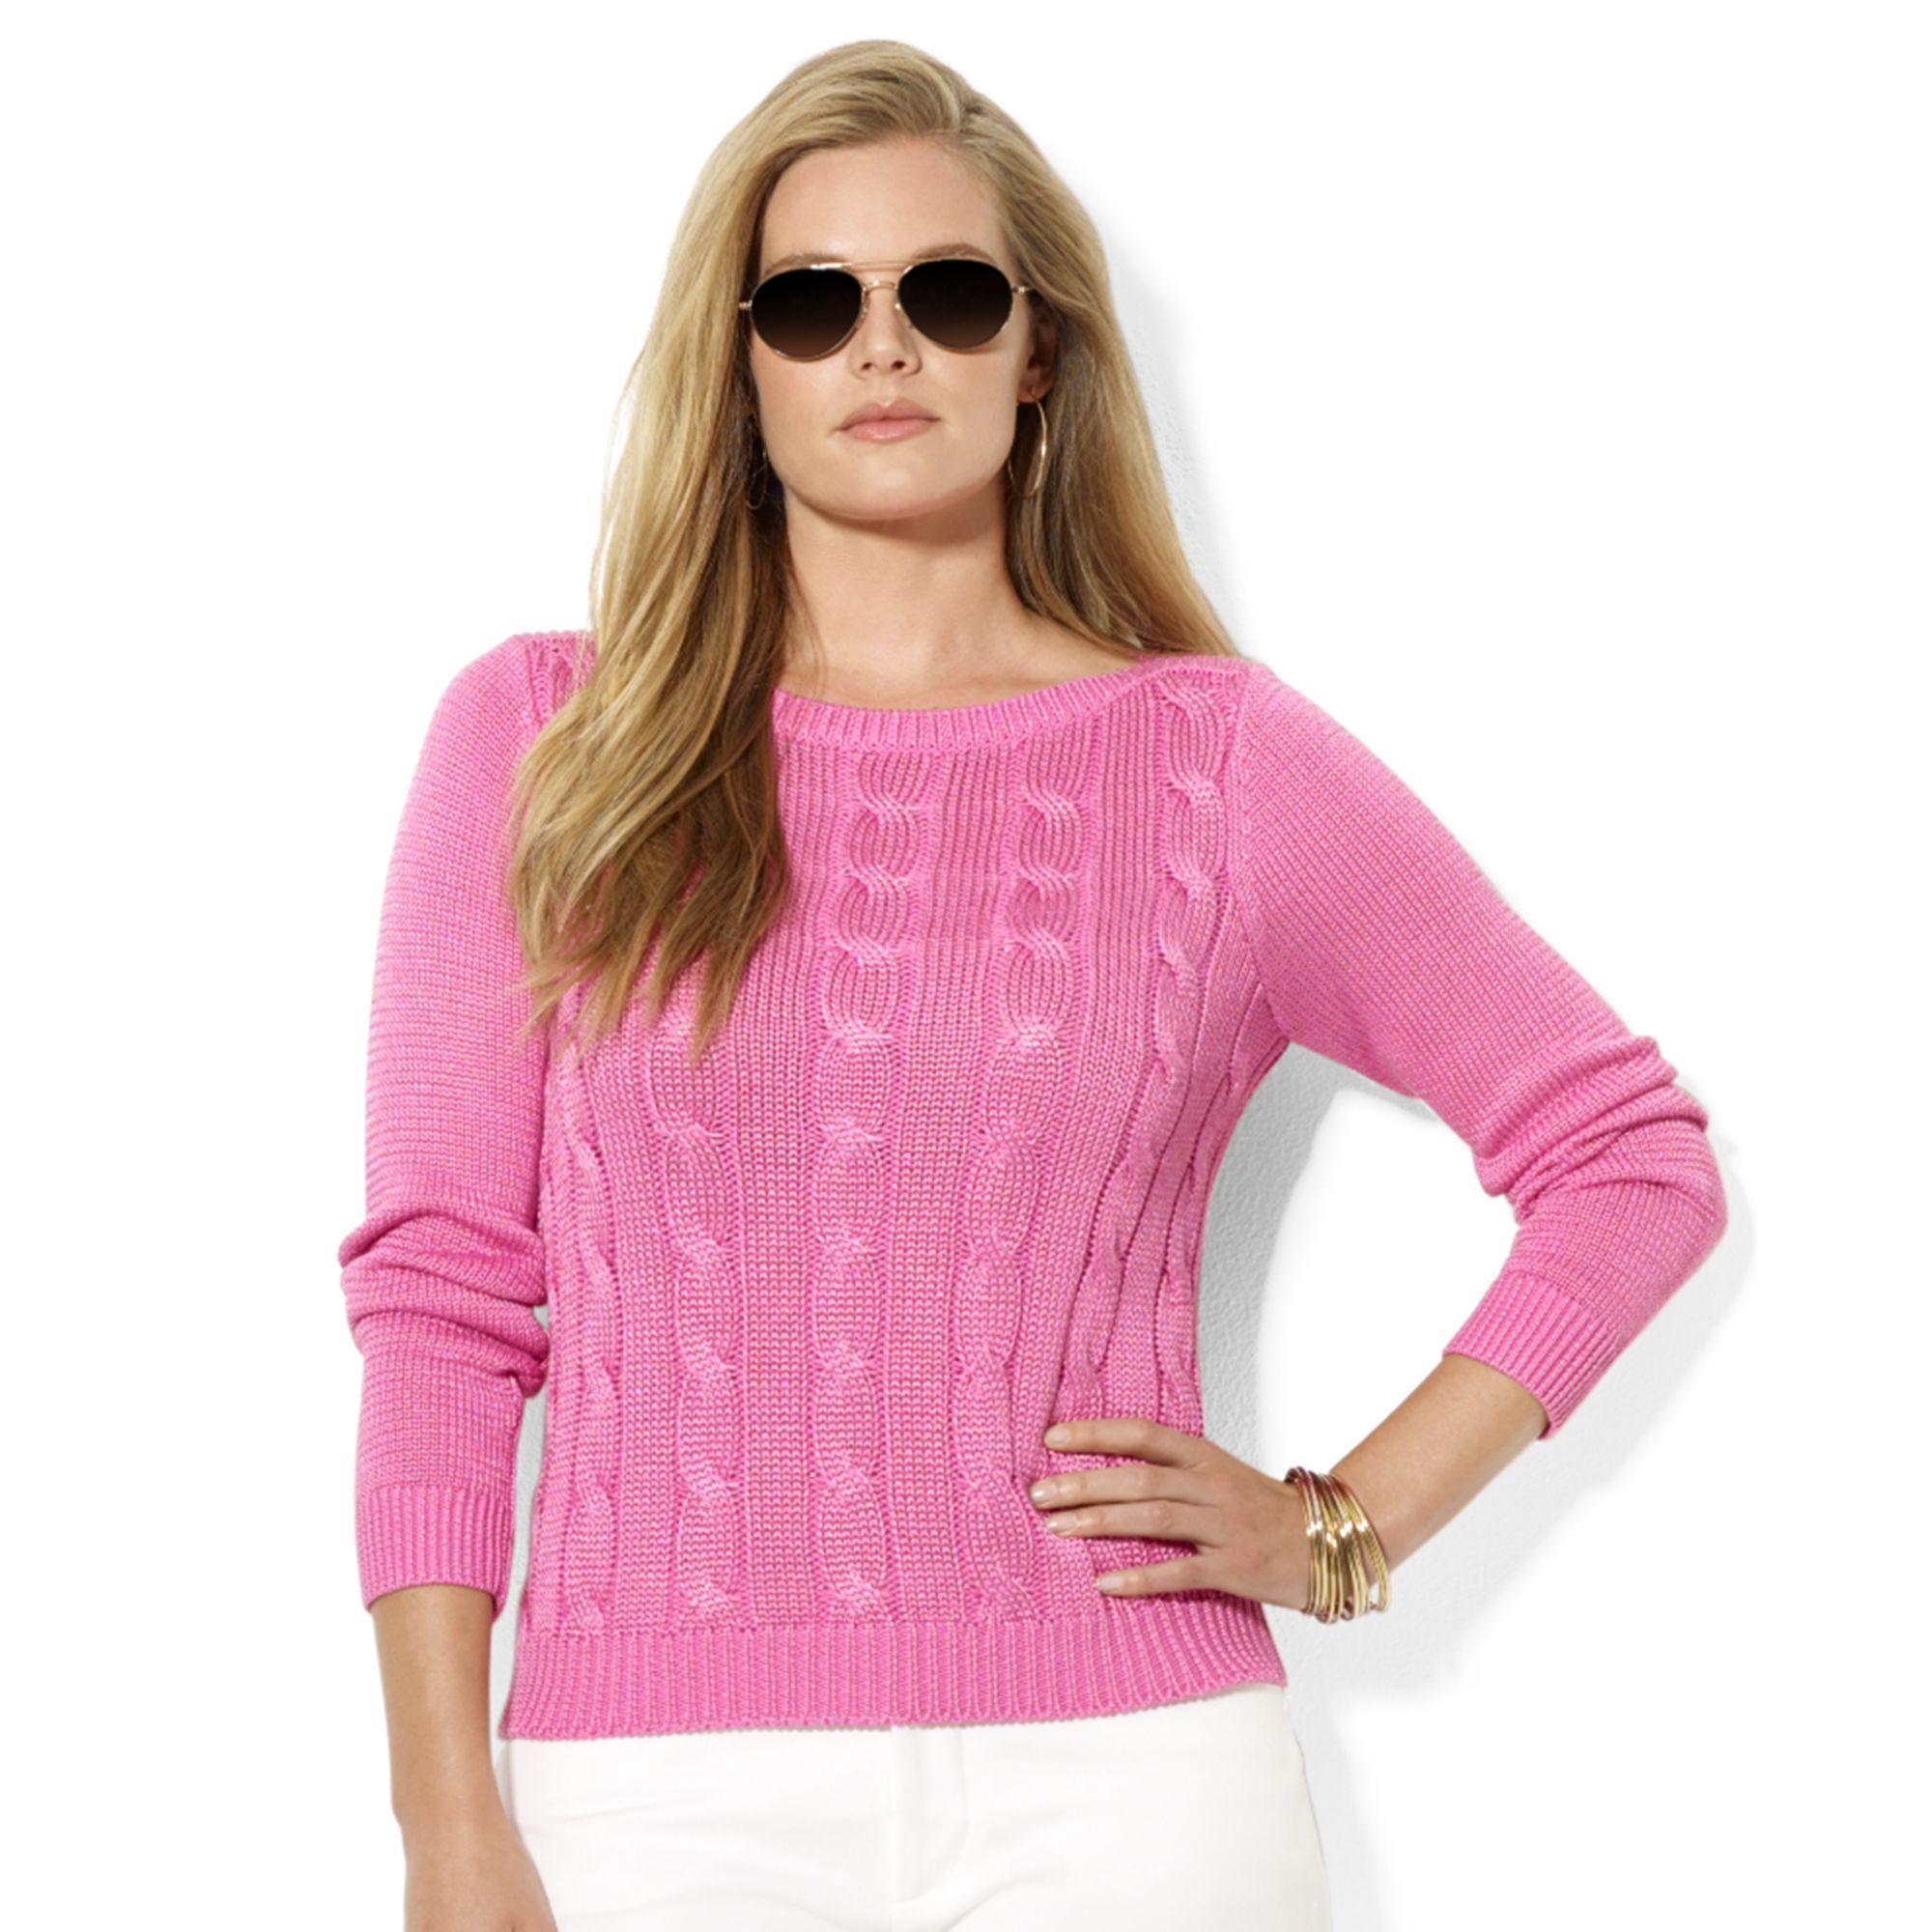 44f6797535a4 Lyst - Lauren by Ralph Lauren Plus Size Cableknit Boatneck Sweater ...